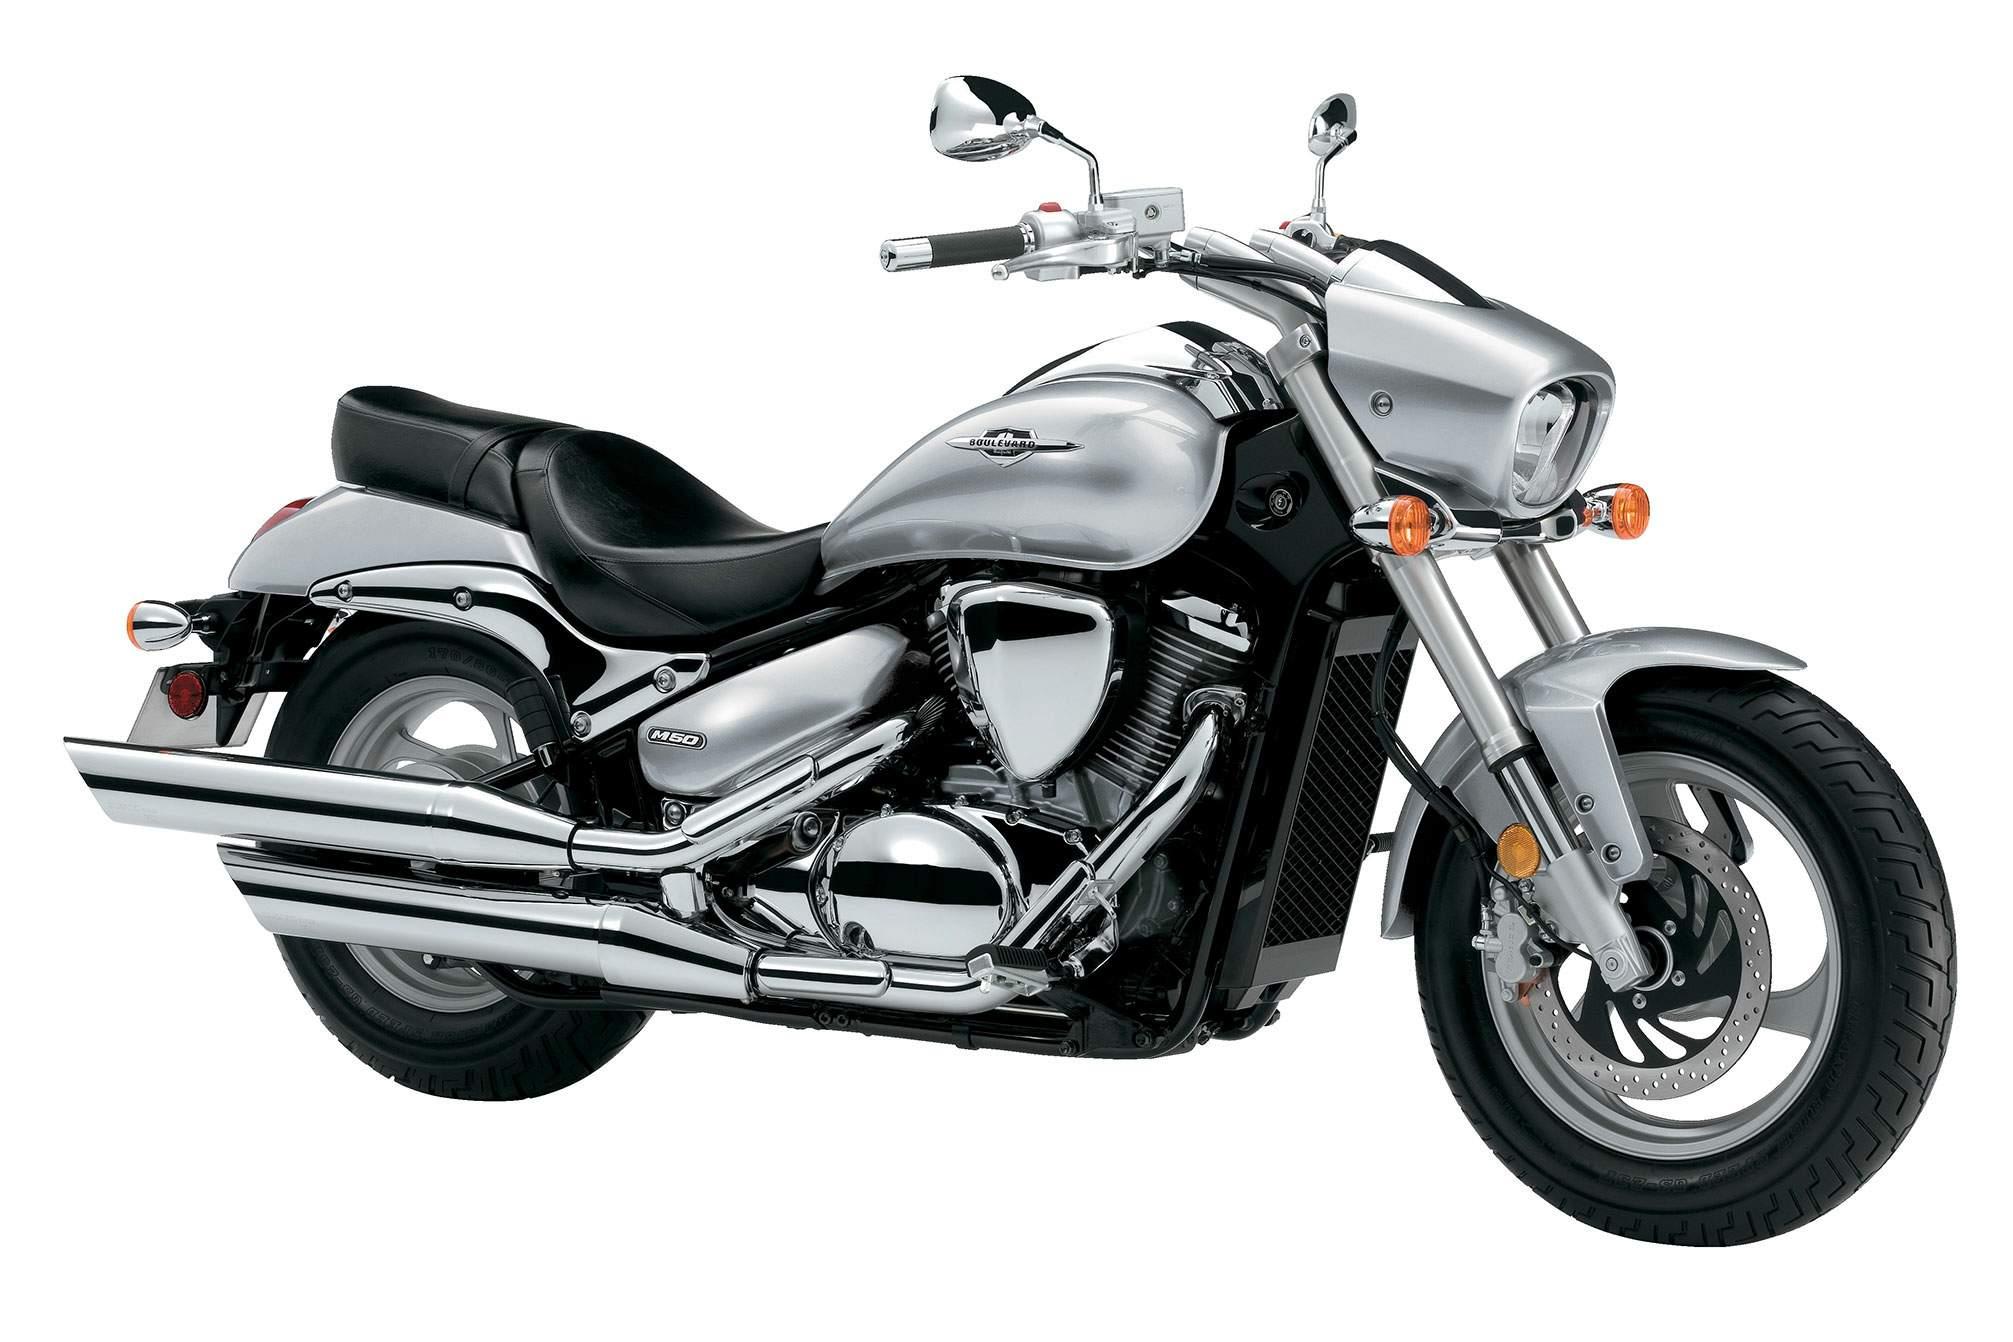 Тест-драйв мотоцикла Suzuki Intruder 800